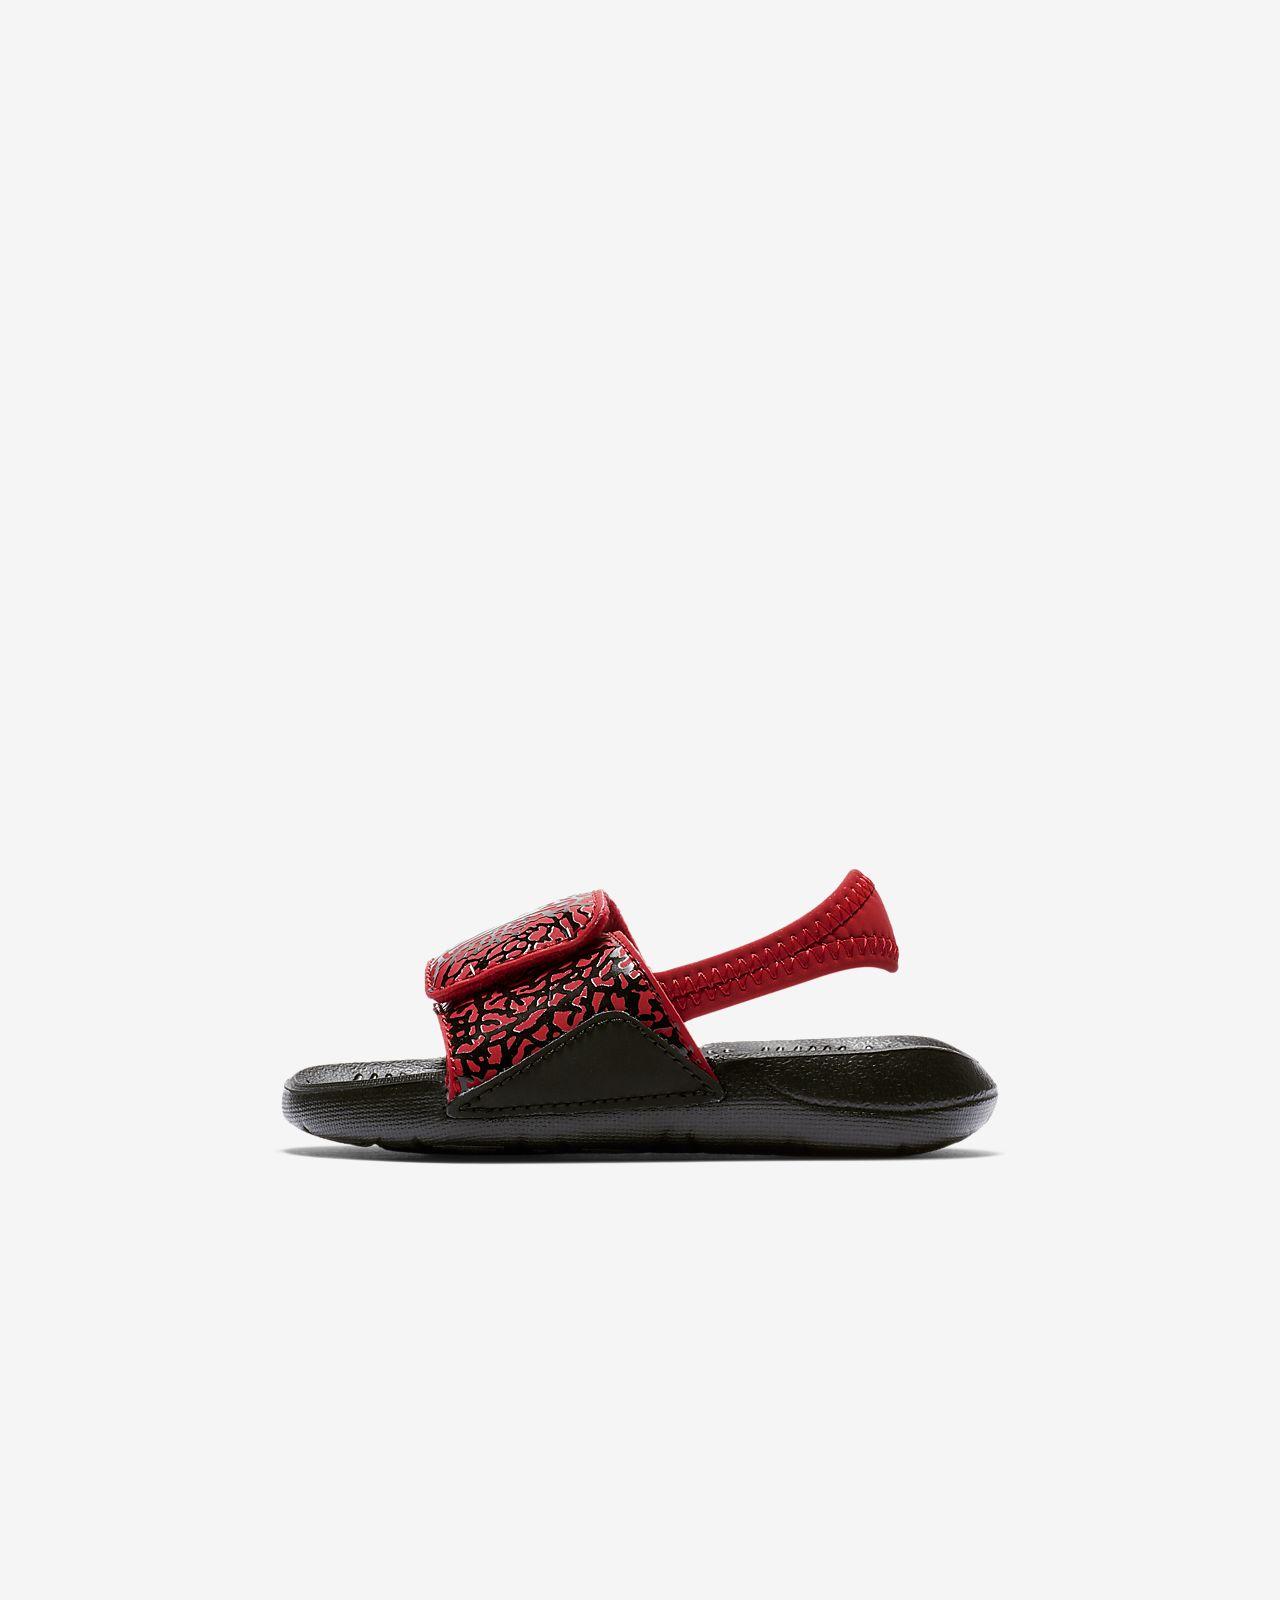 7a0654150ab22 Jordan Hydro 7 V2 Toddler Slide. Nike.com ID